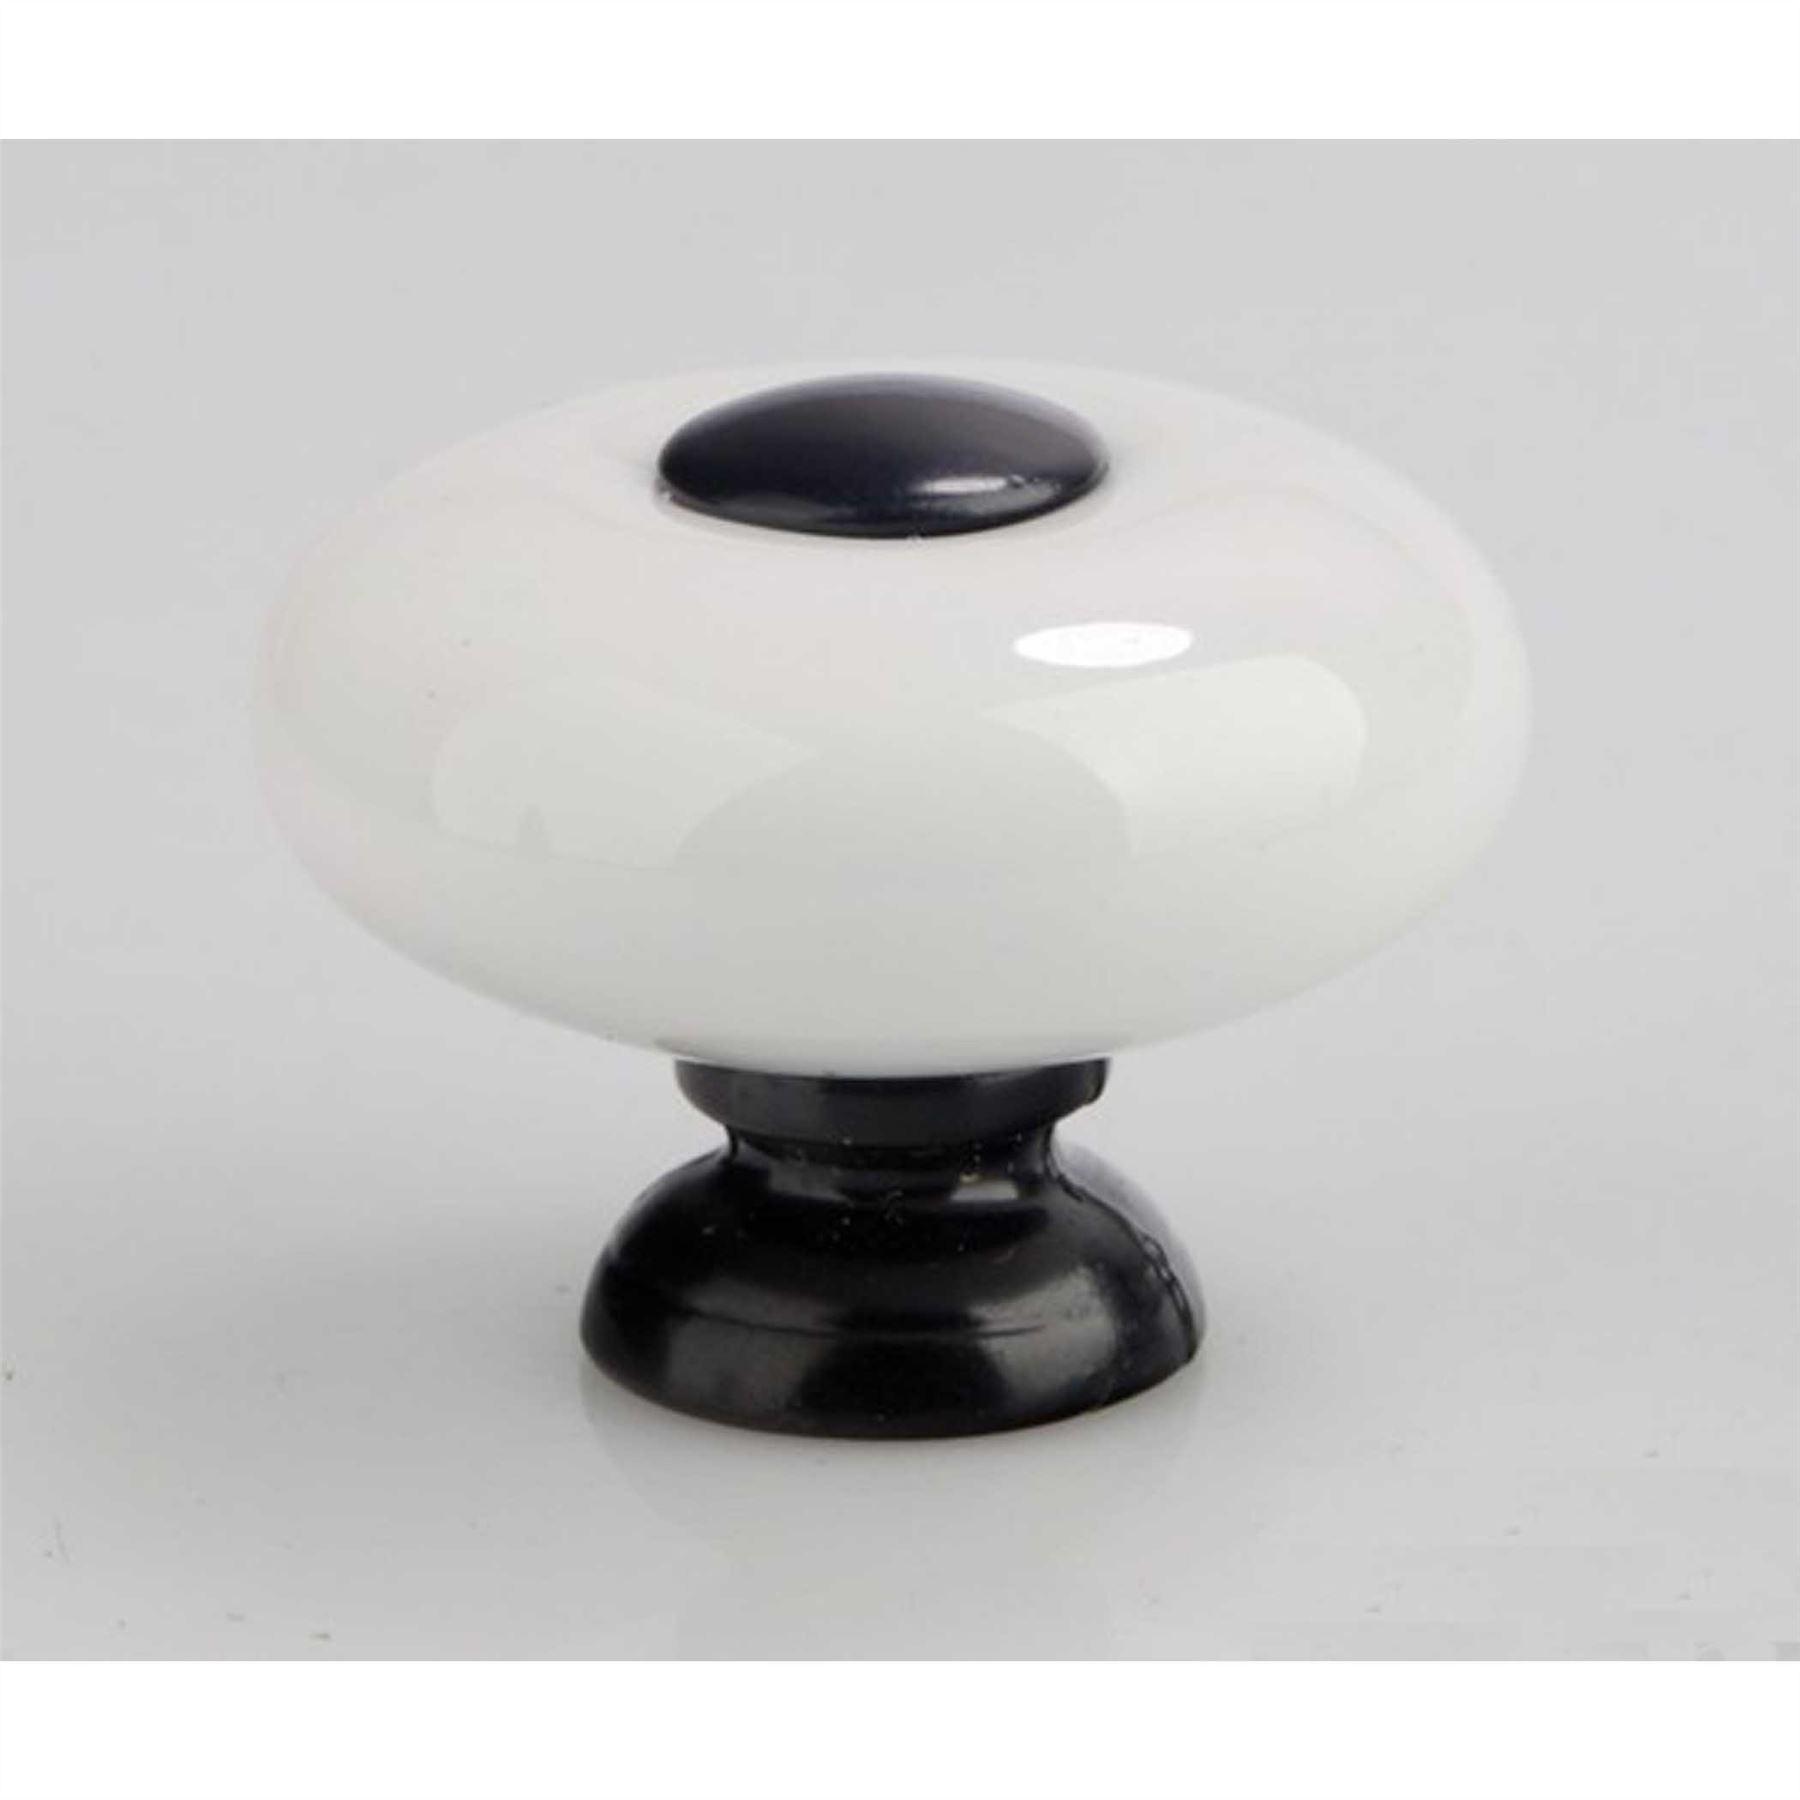 541115-De-Lujo-Armario-Tirador-Cajon-Puerta-Mango-Ceramica-Negra